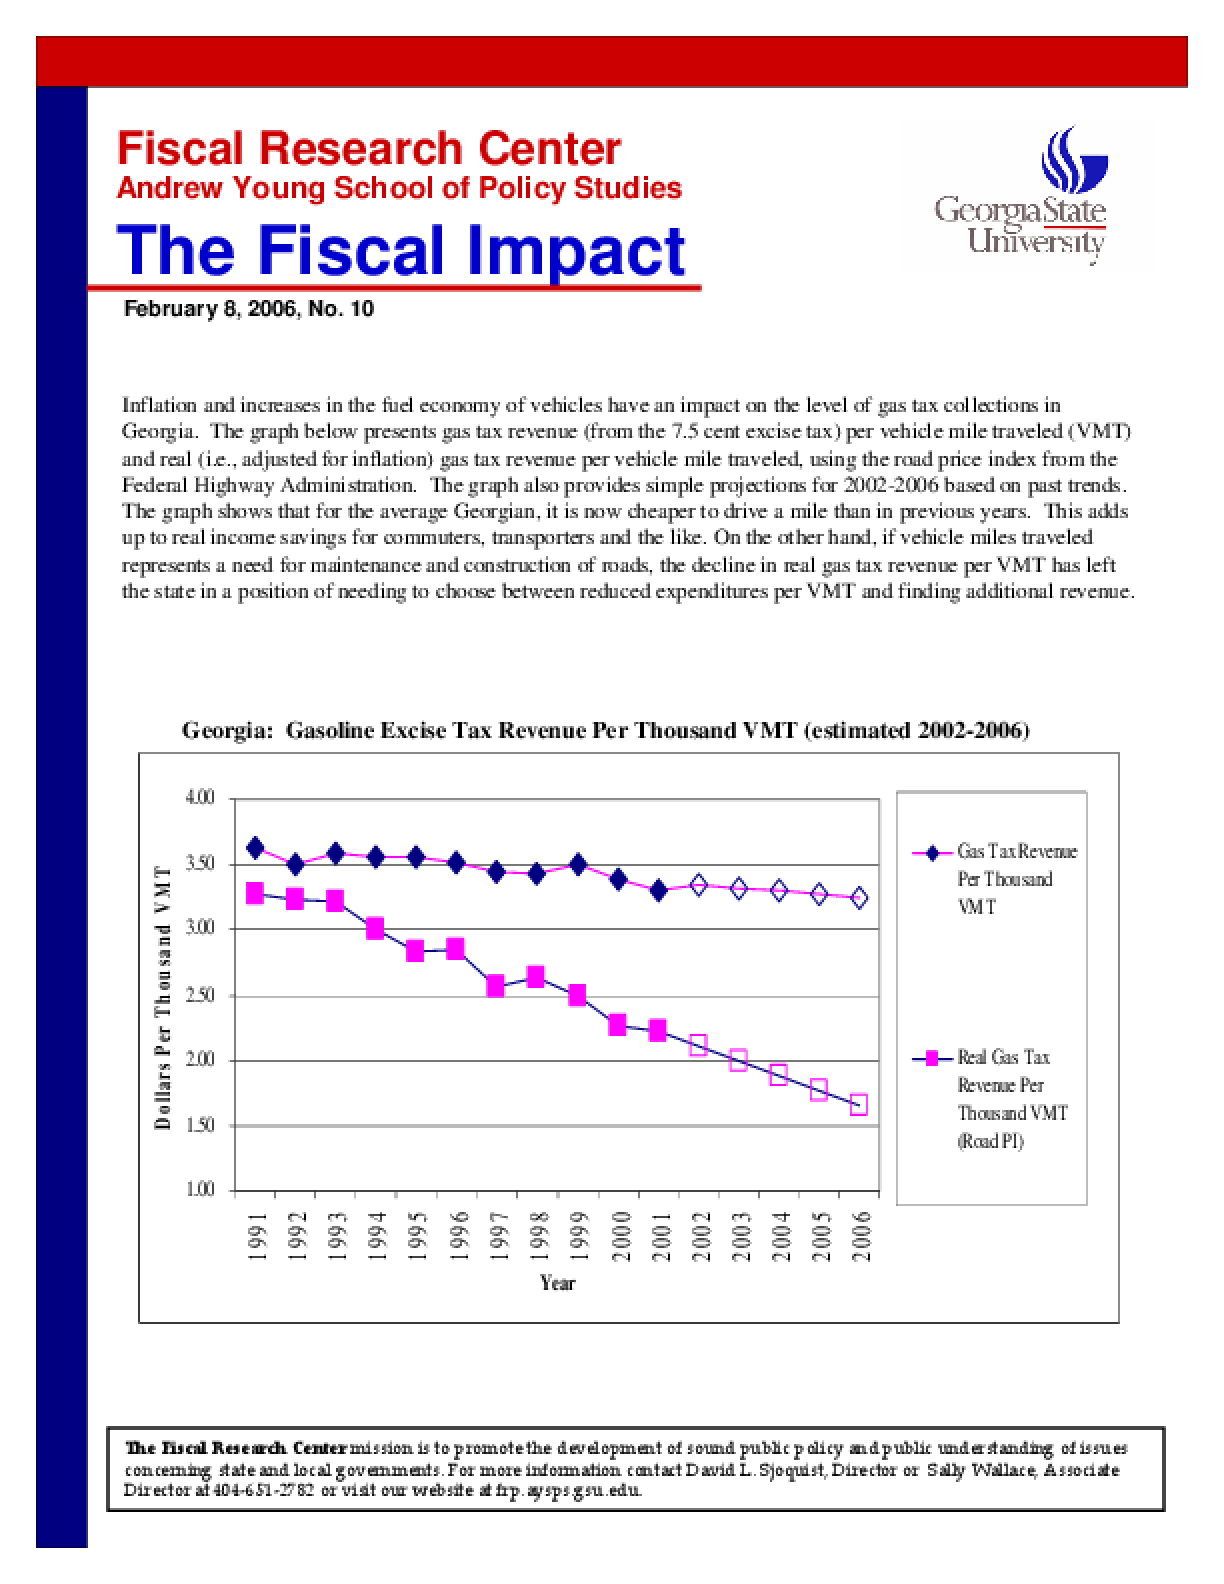 Trends in Gas Tax Revenue